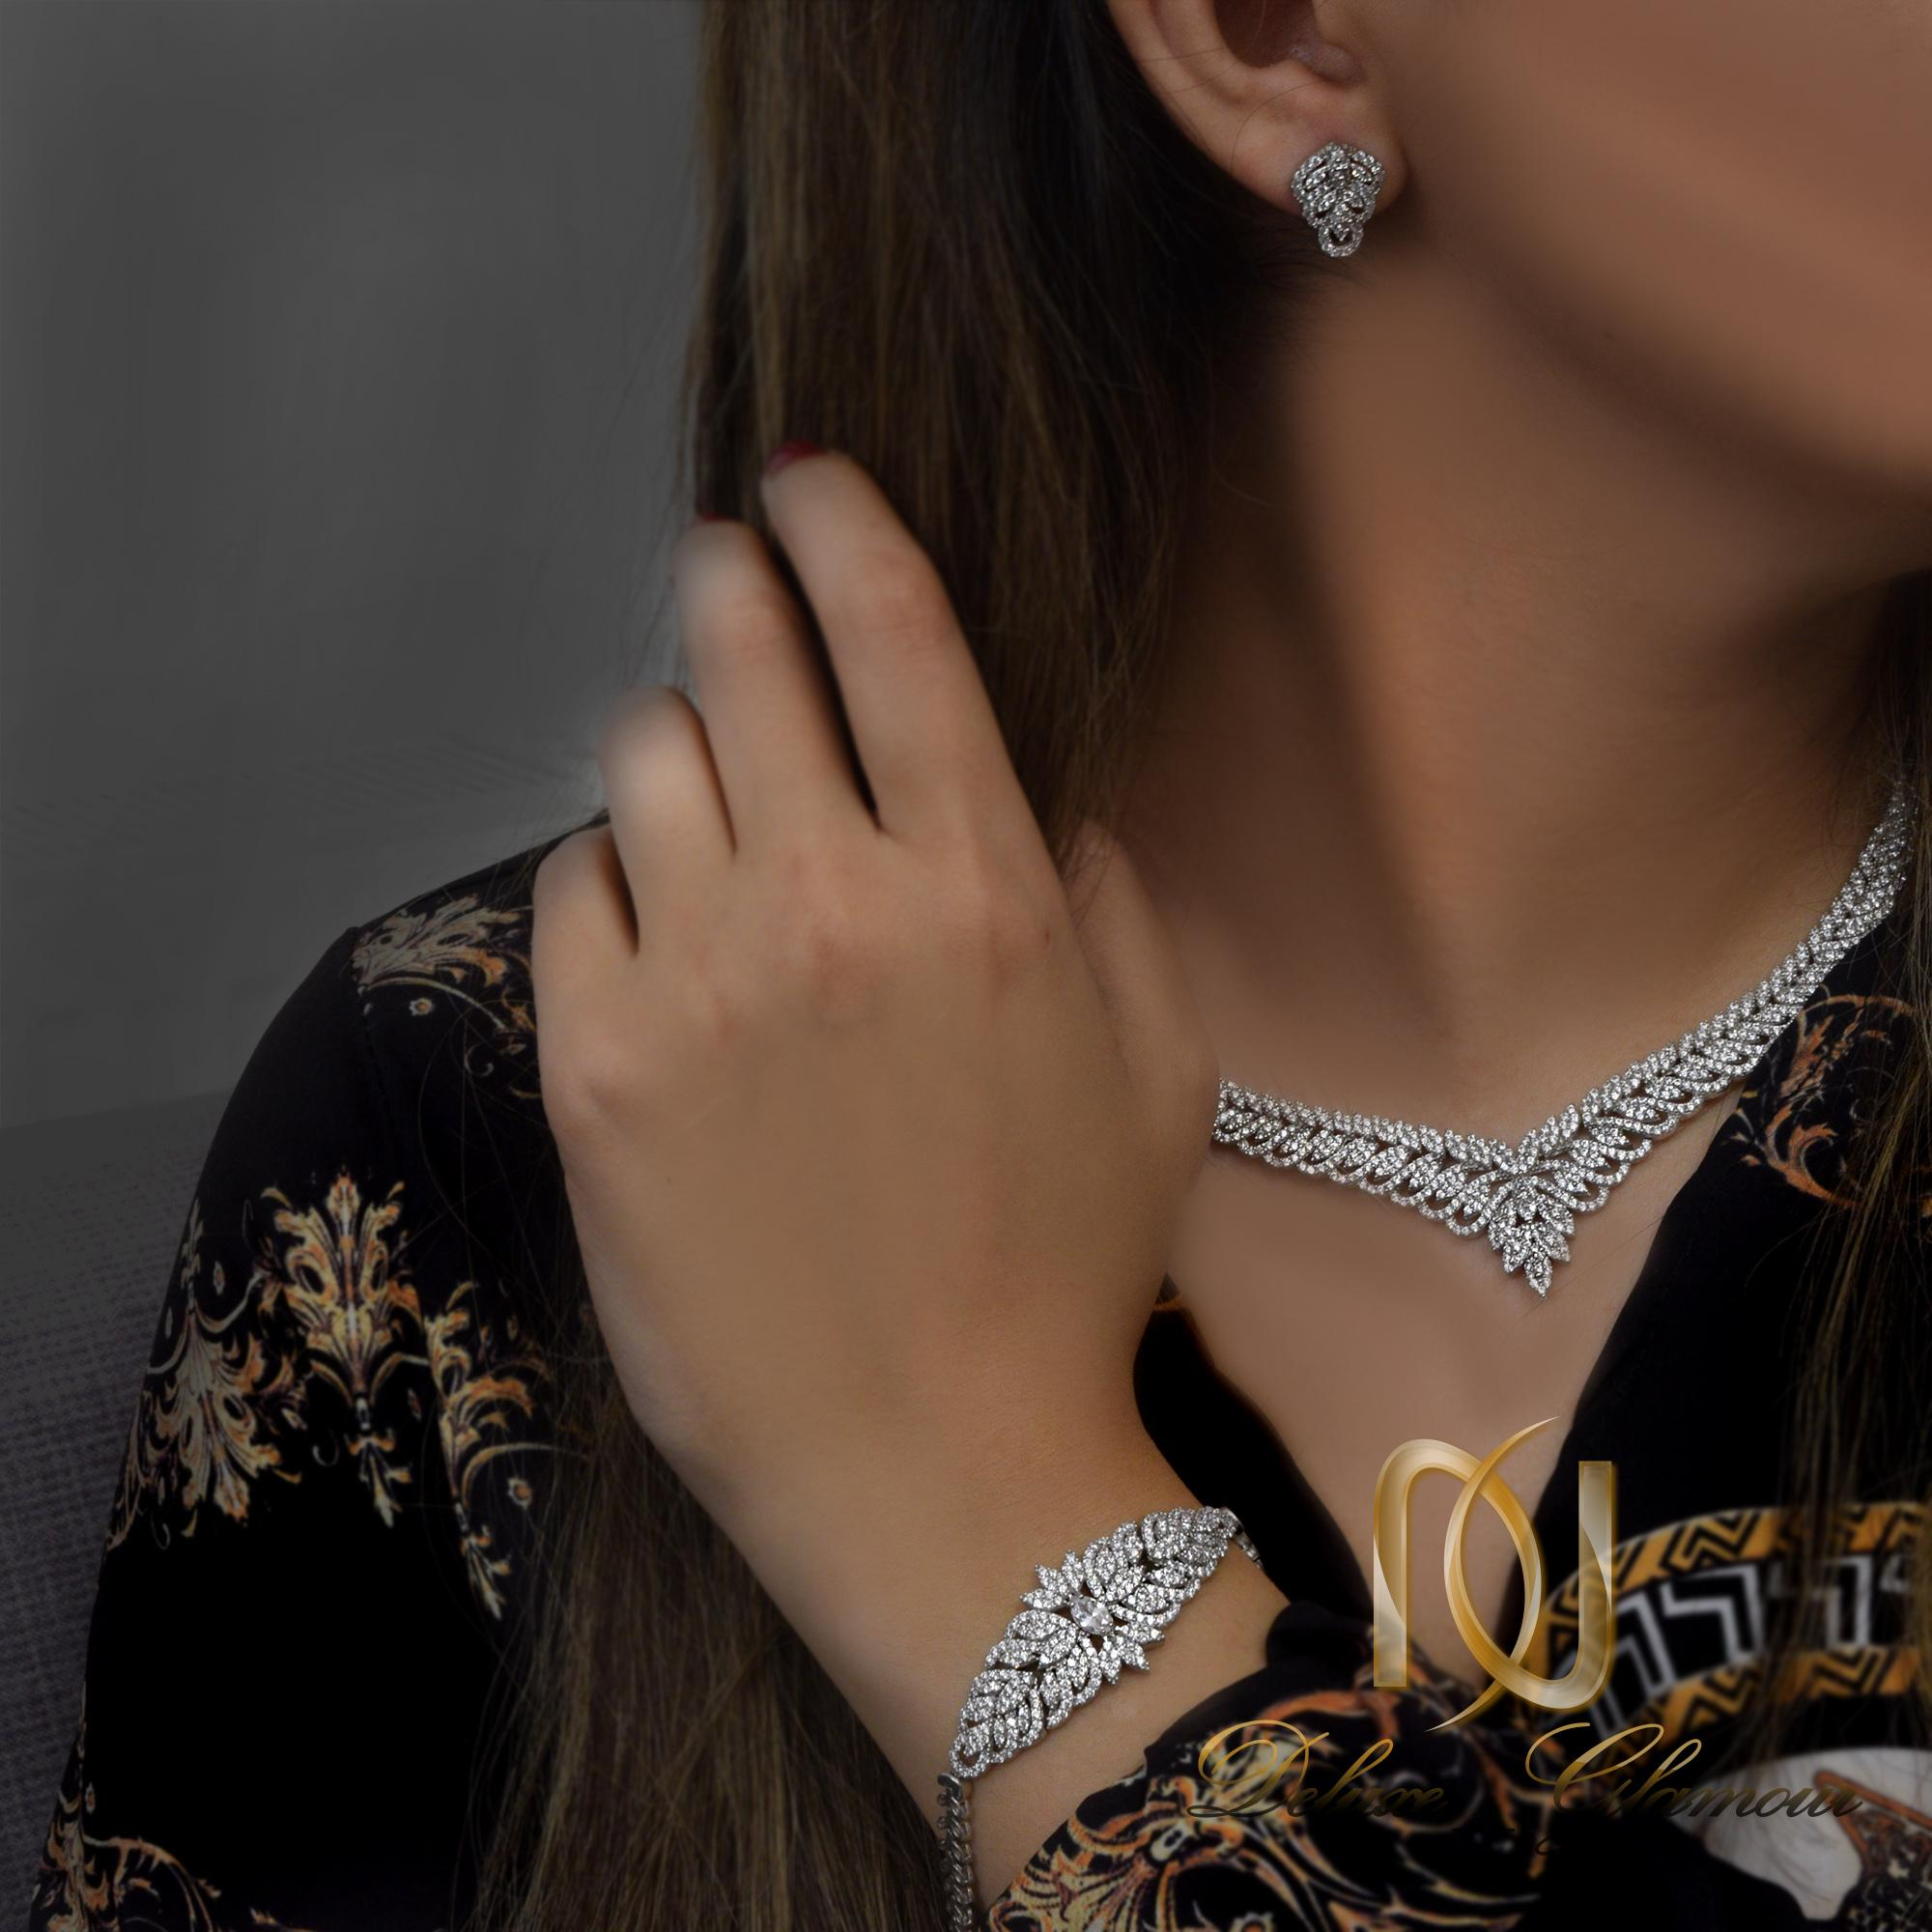 سرویس عروس نقره طرح جواهری ns-n257 از نمای روبرو